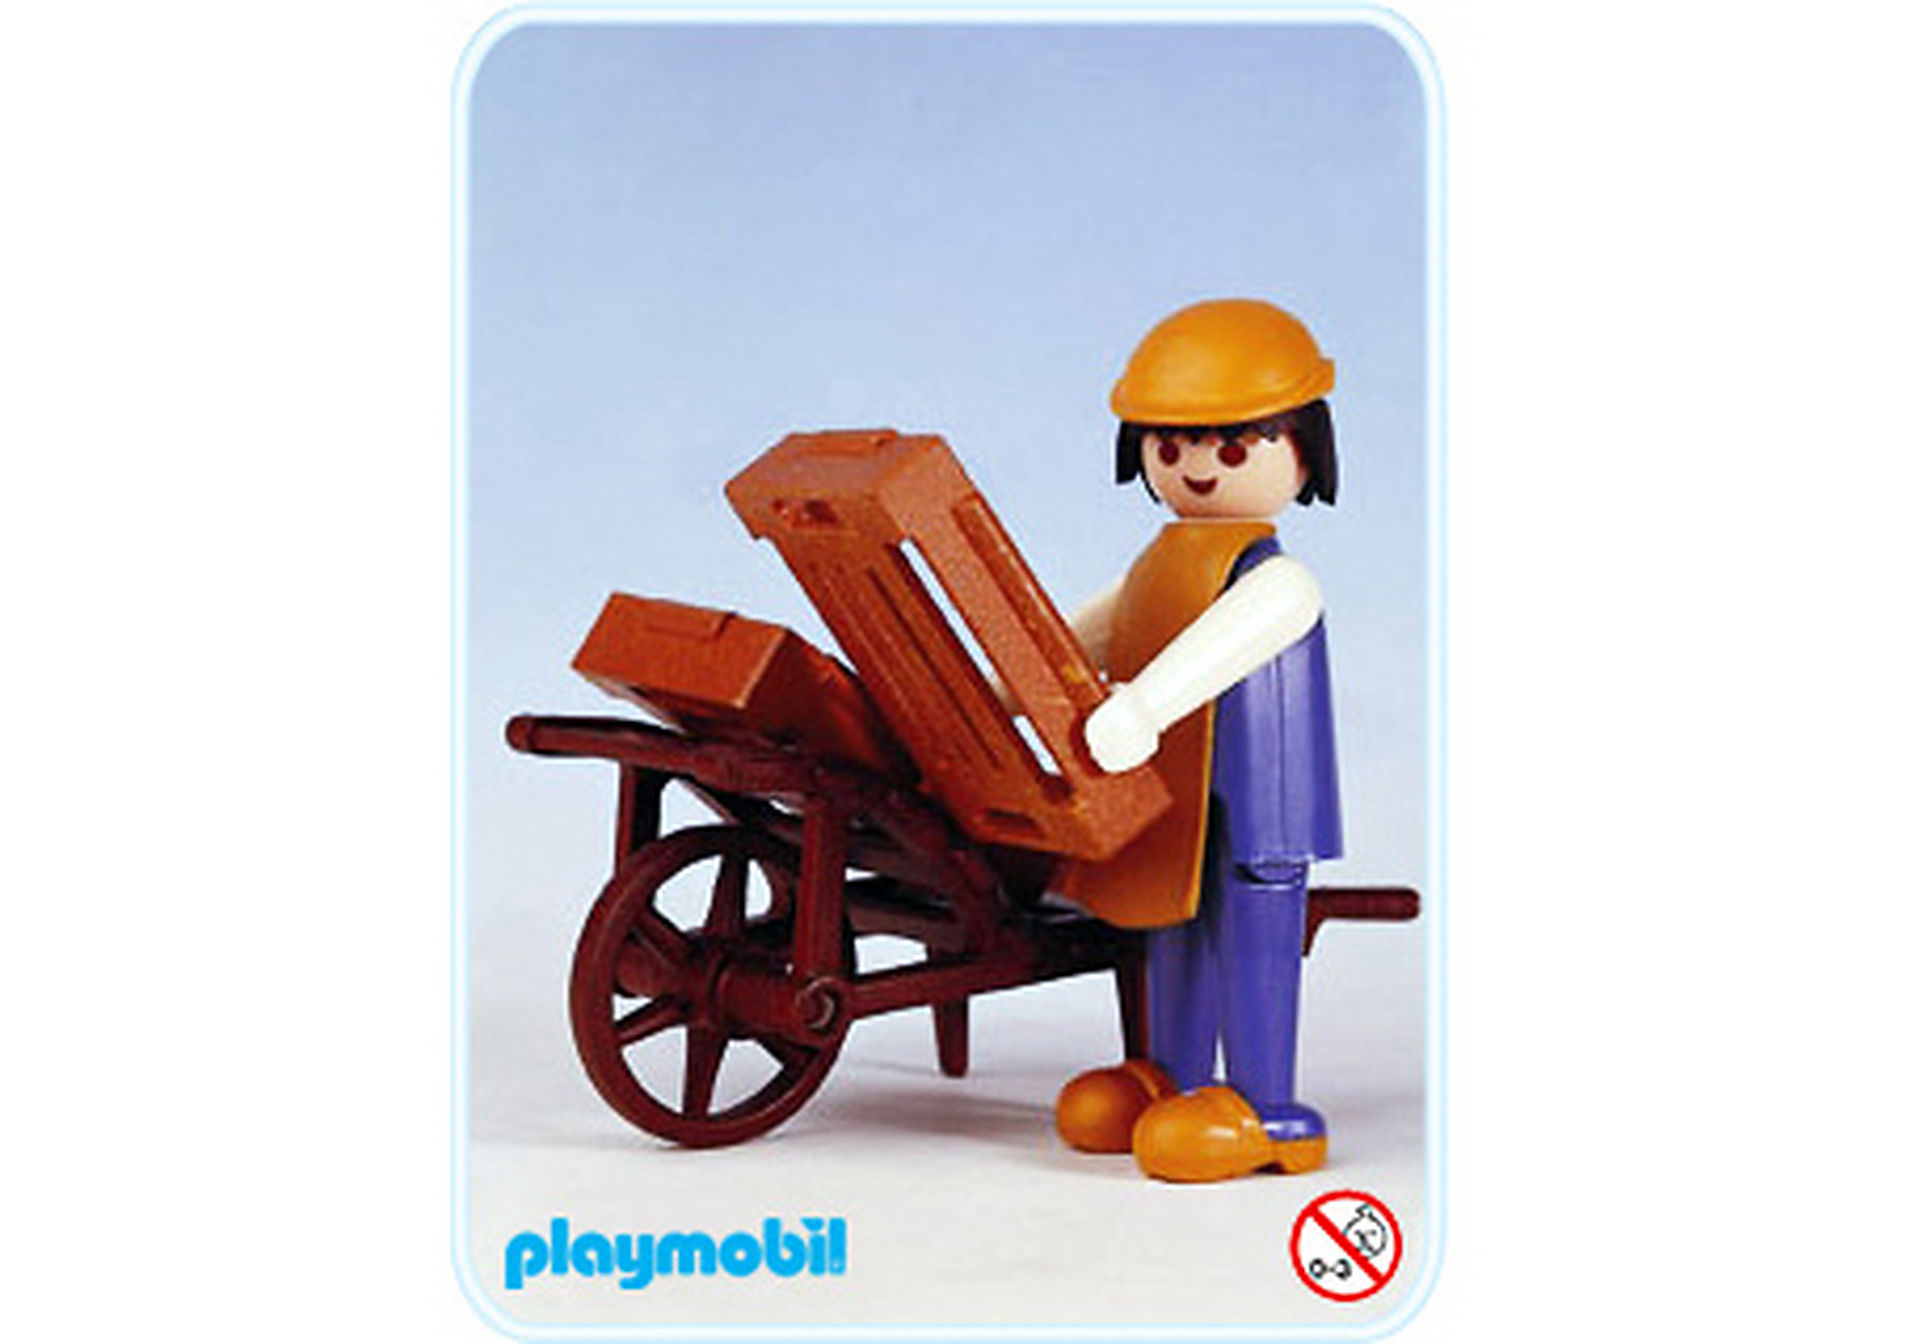 http://media.playmobil.com/i/playmobil/3369-A_product_detail/Artisan / brouette